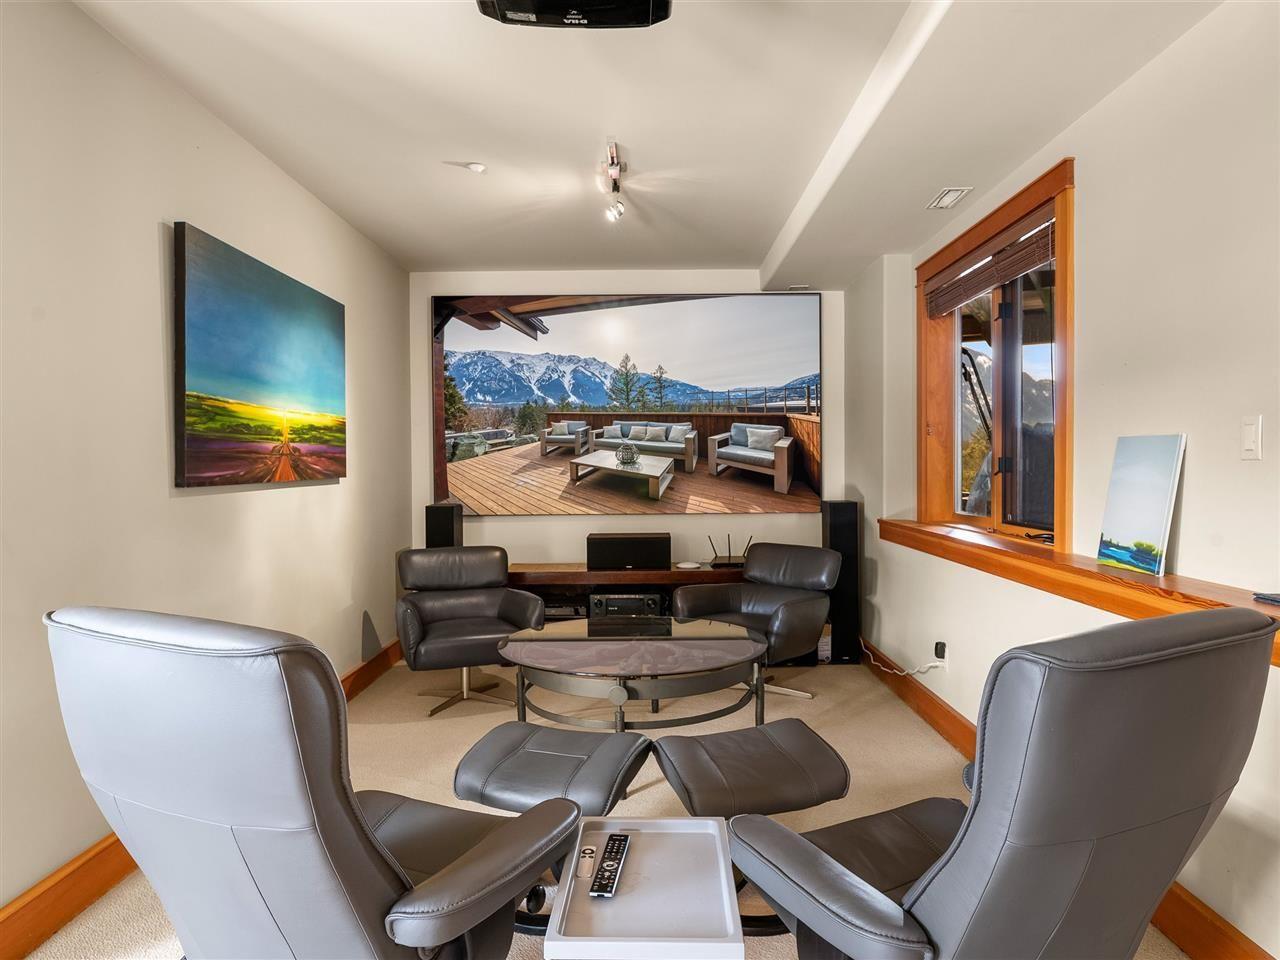 Photo 32: Photos: 1766 PINEWOOD DRIVE: Pemberton House for sale : MLS®# R2543608